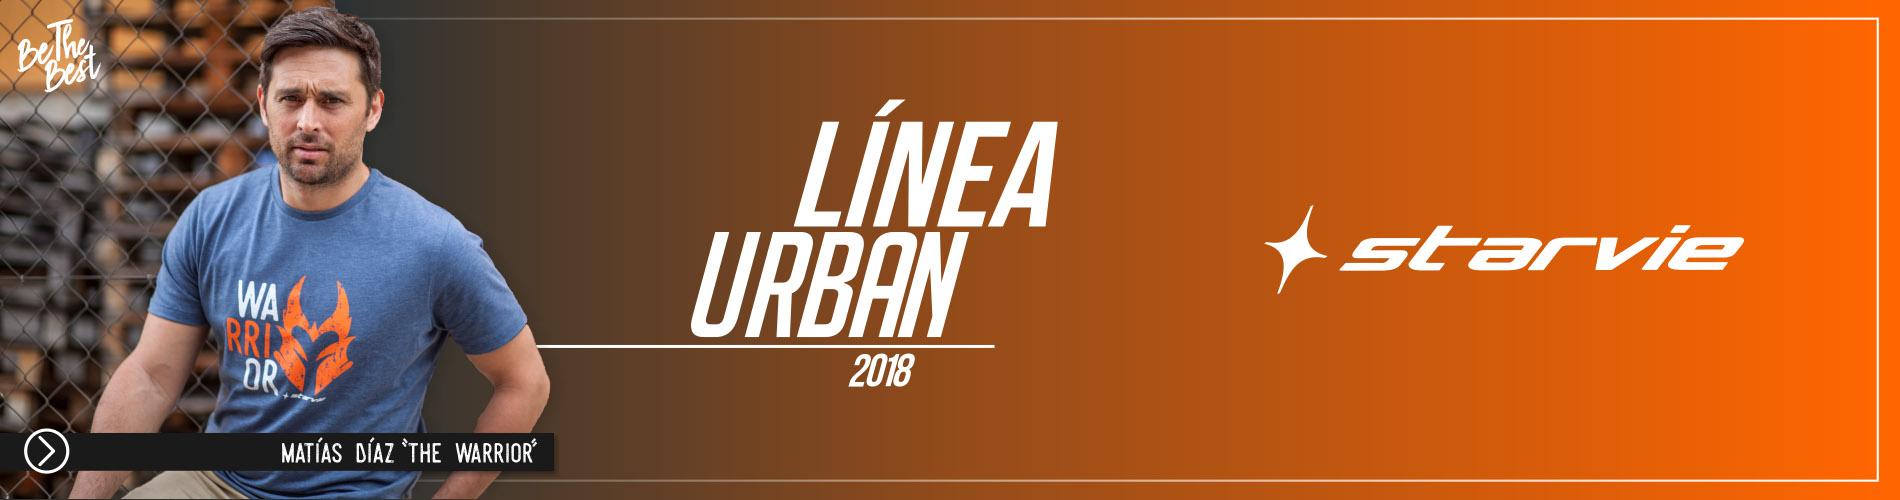 Linea Urban de pádel StarVie